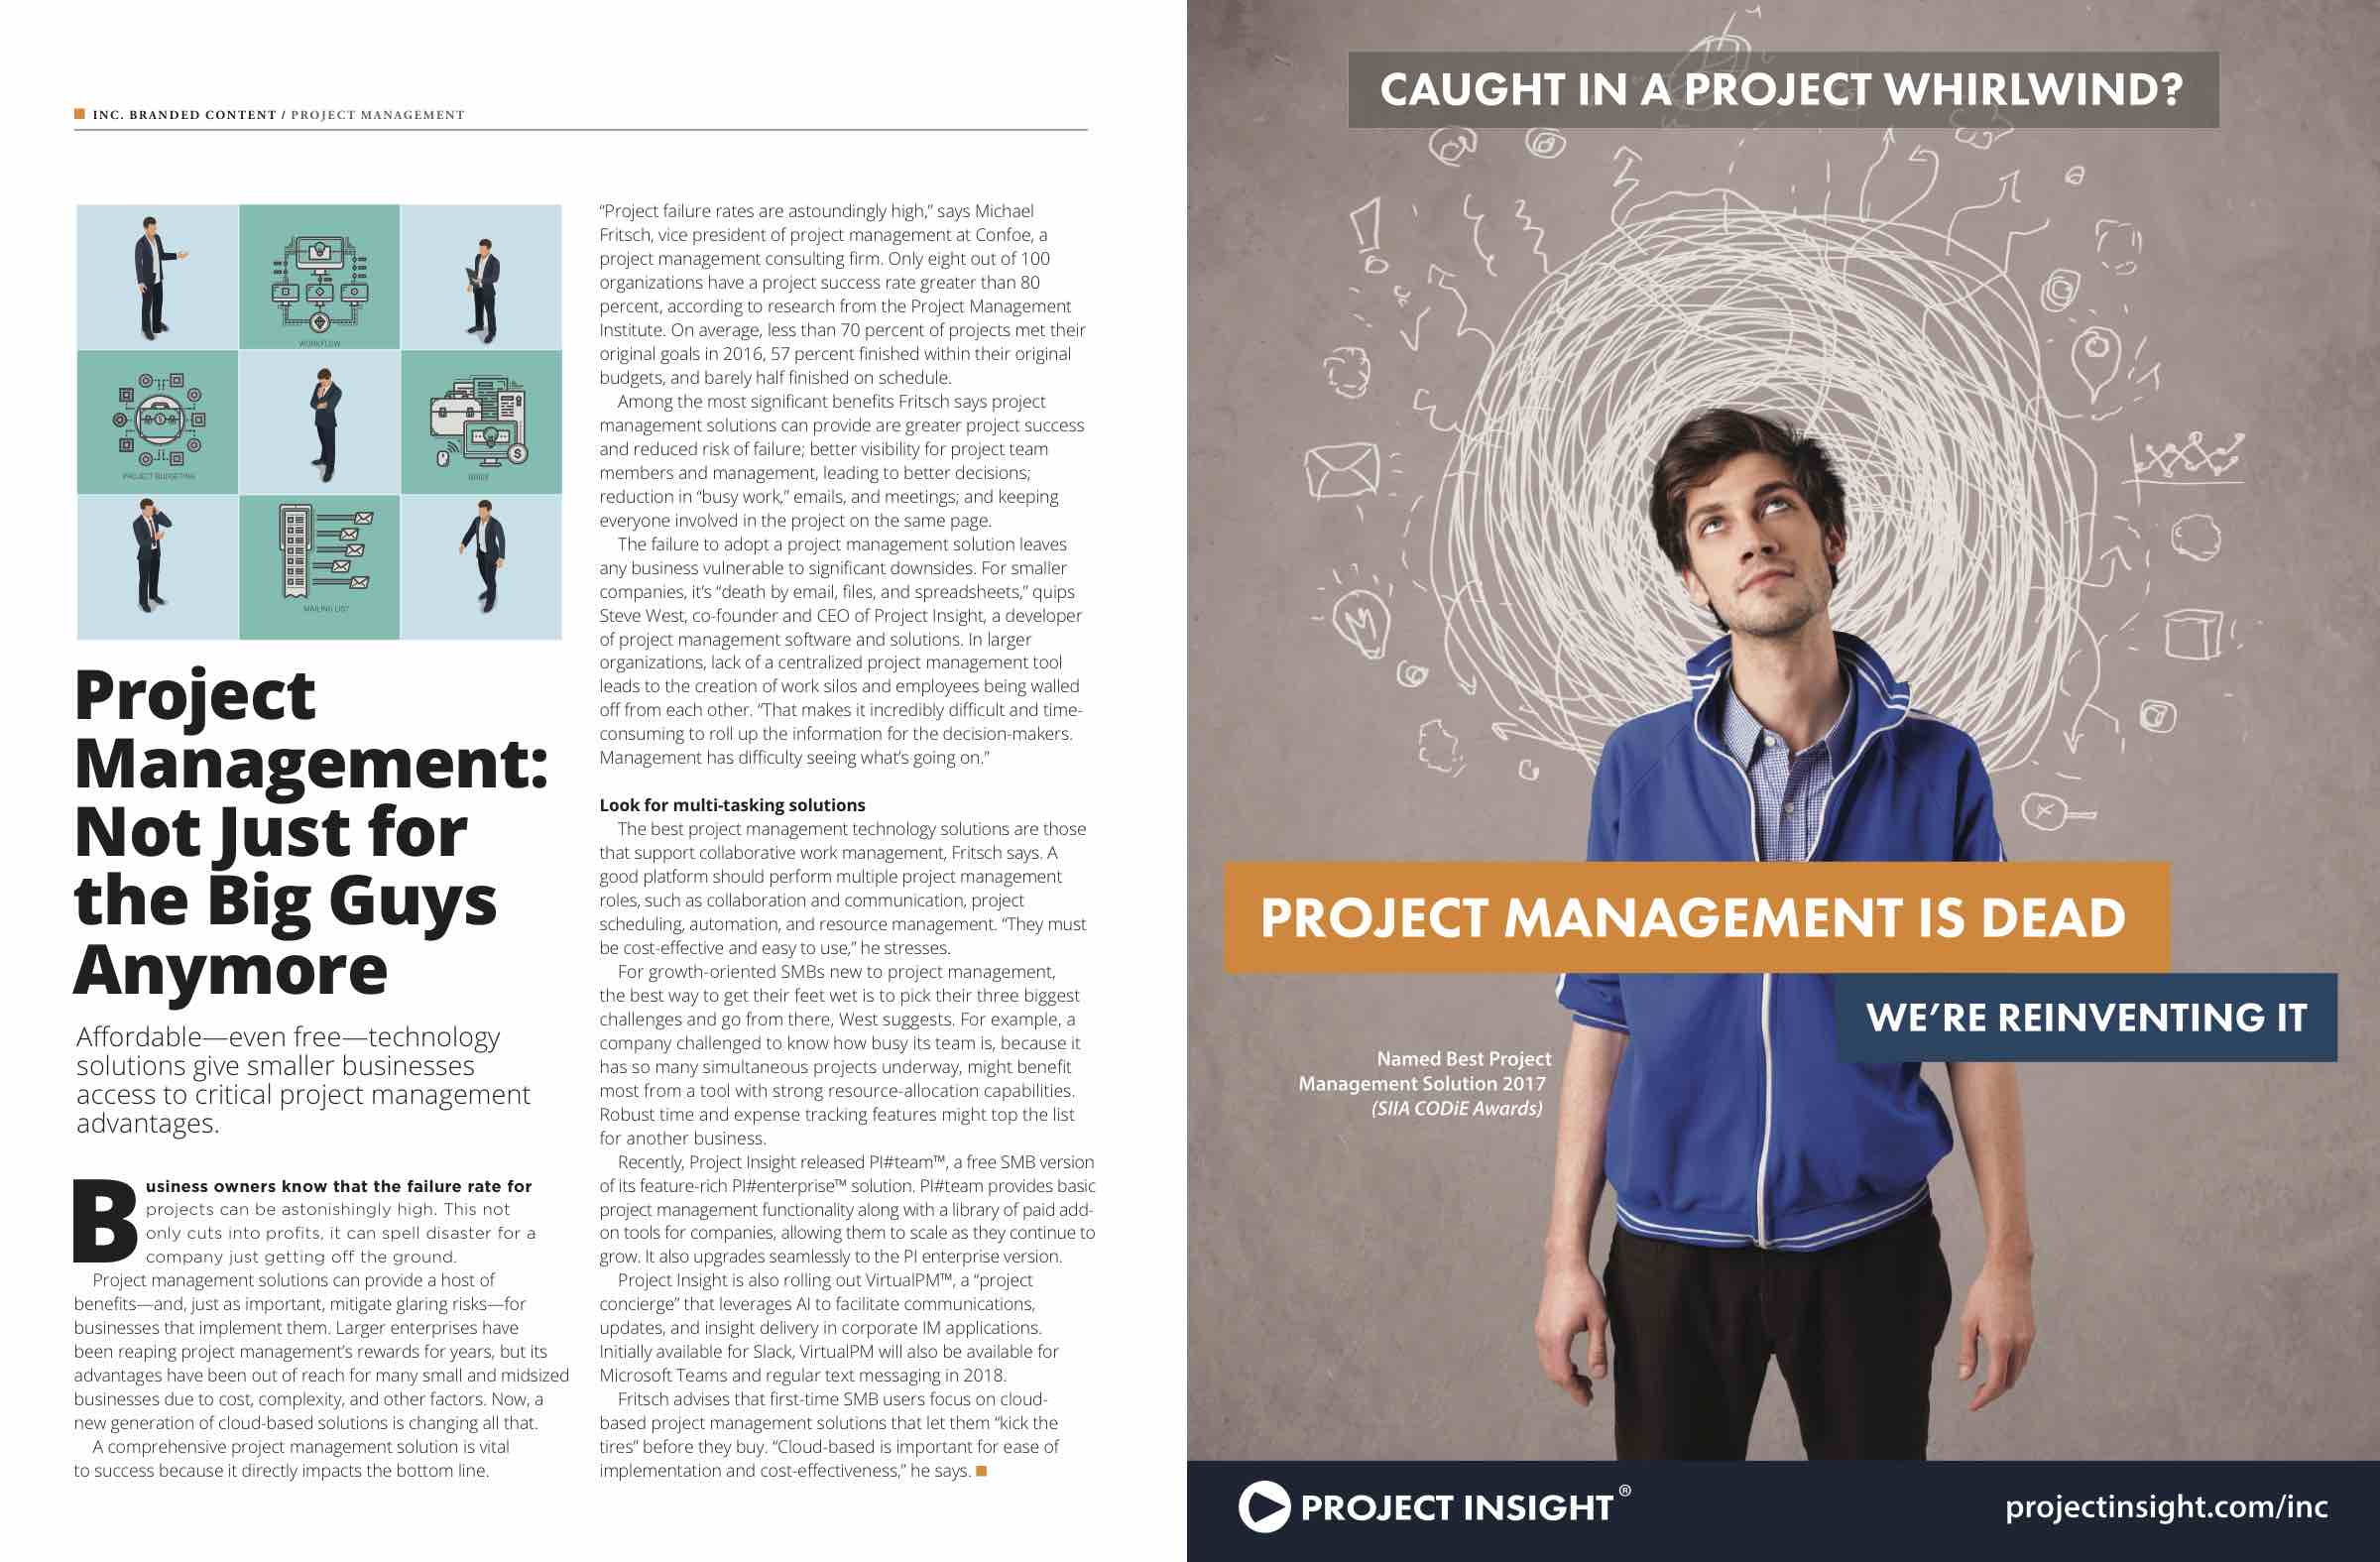 https://www.incimages.com/branded-content/ProjectManagementDec2017.compressed.jpg